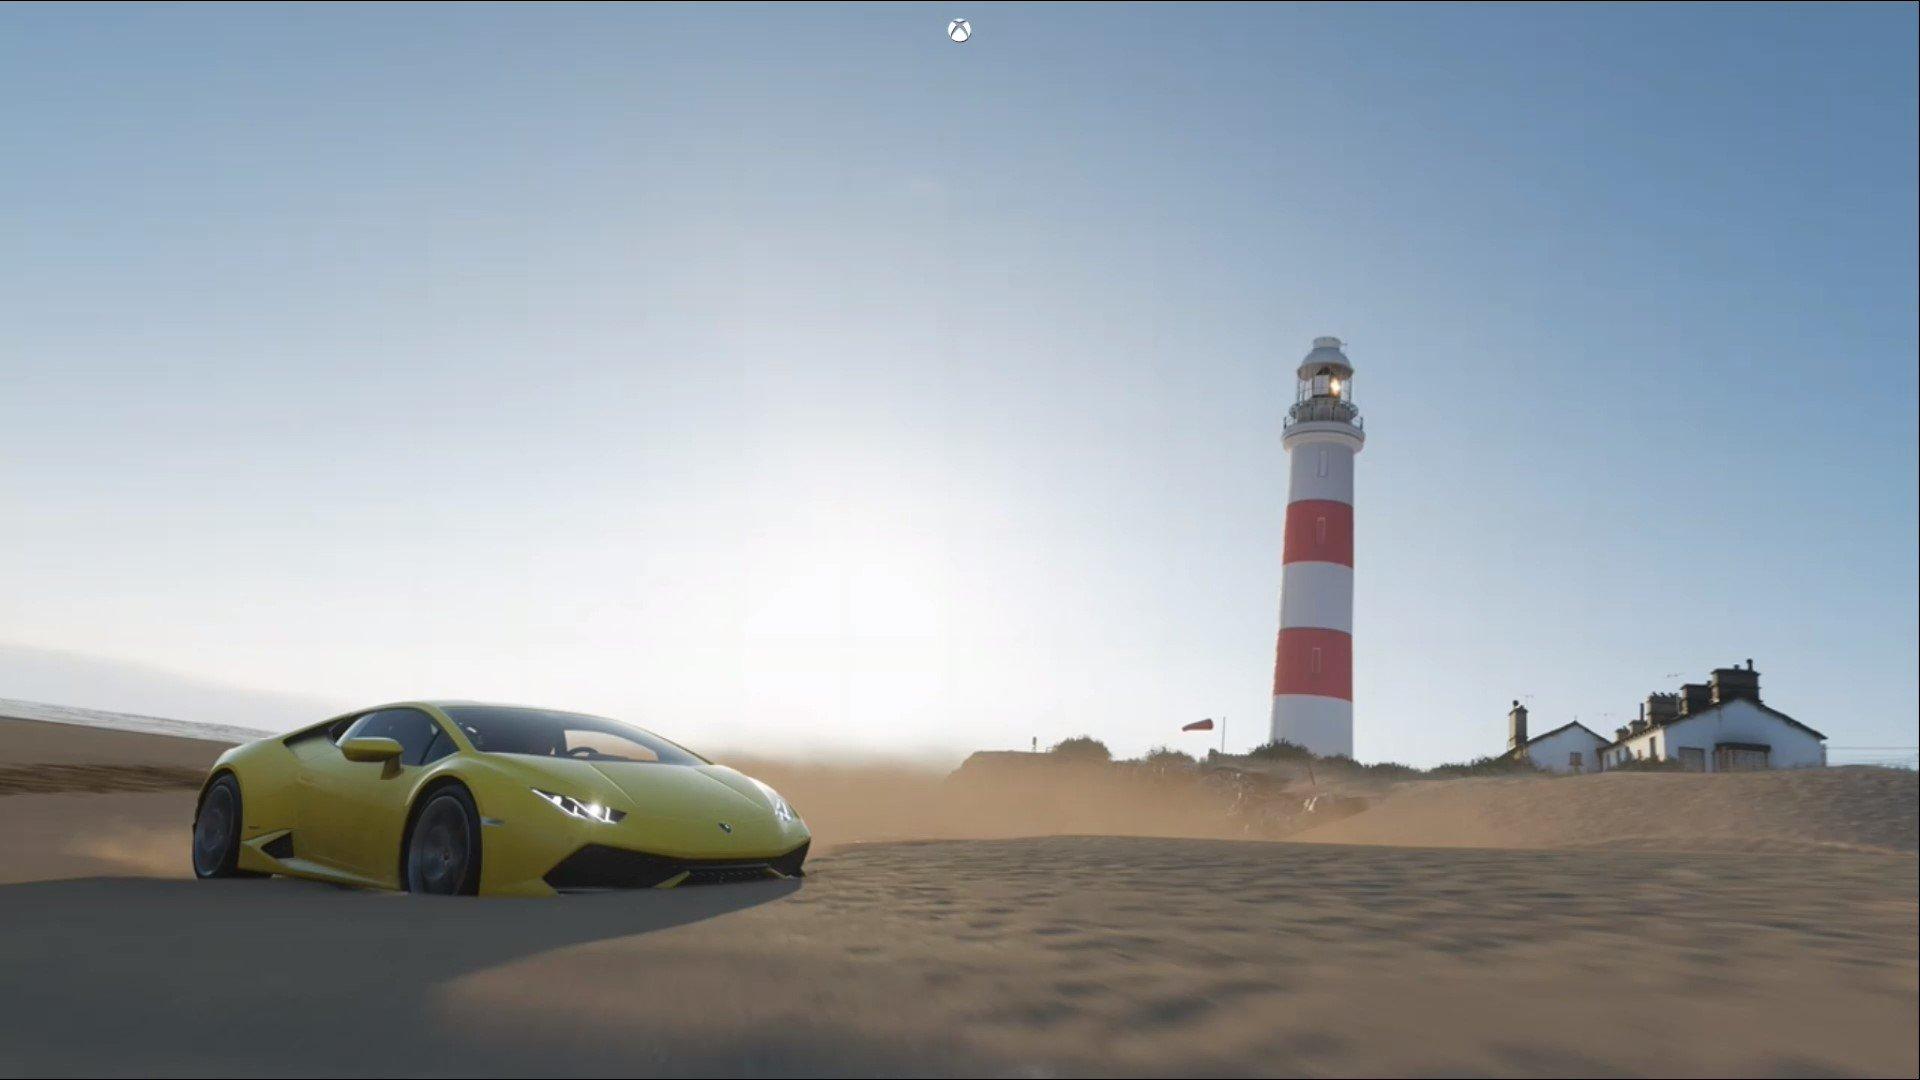 Forza-Horizon-4-Series-24-Photo-Challenge-Lamborghini-Hiver